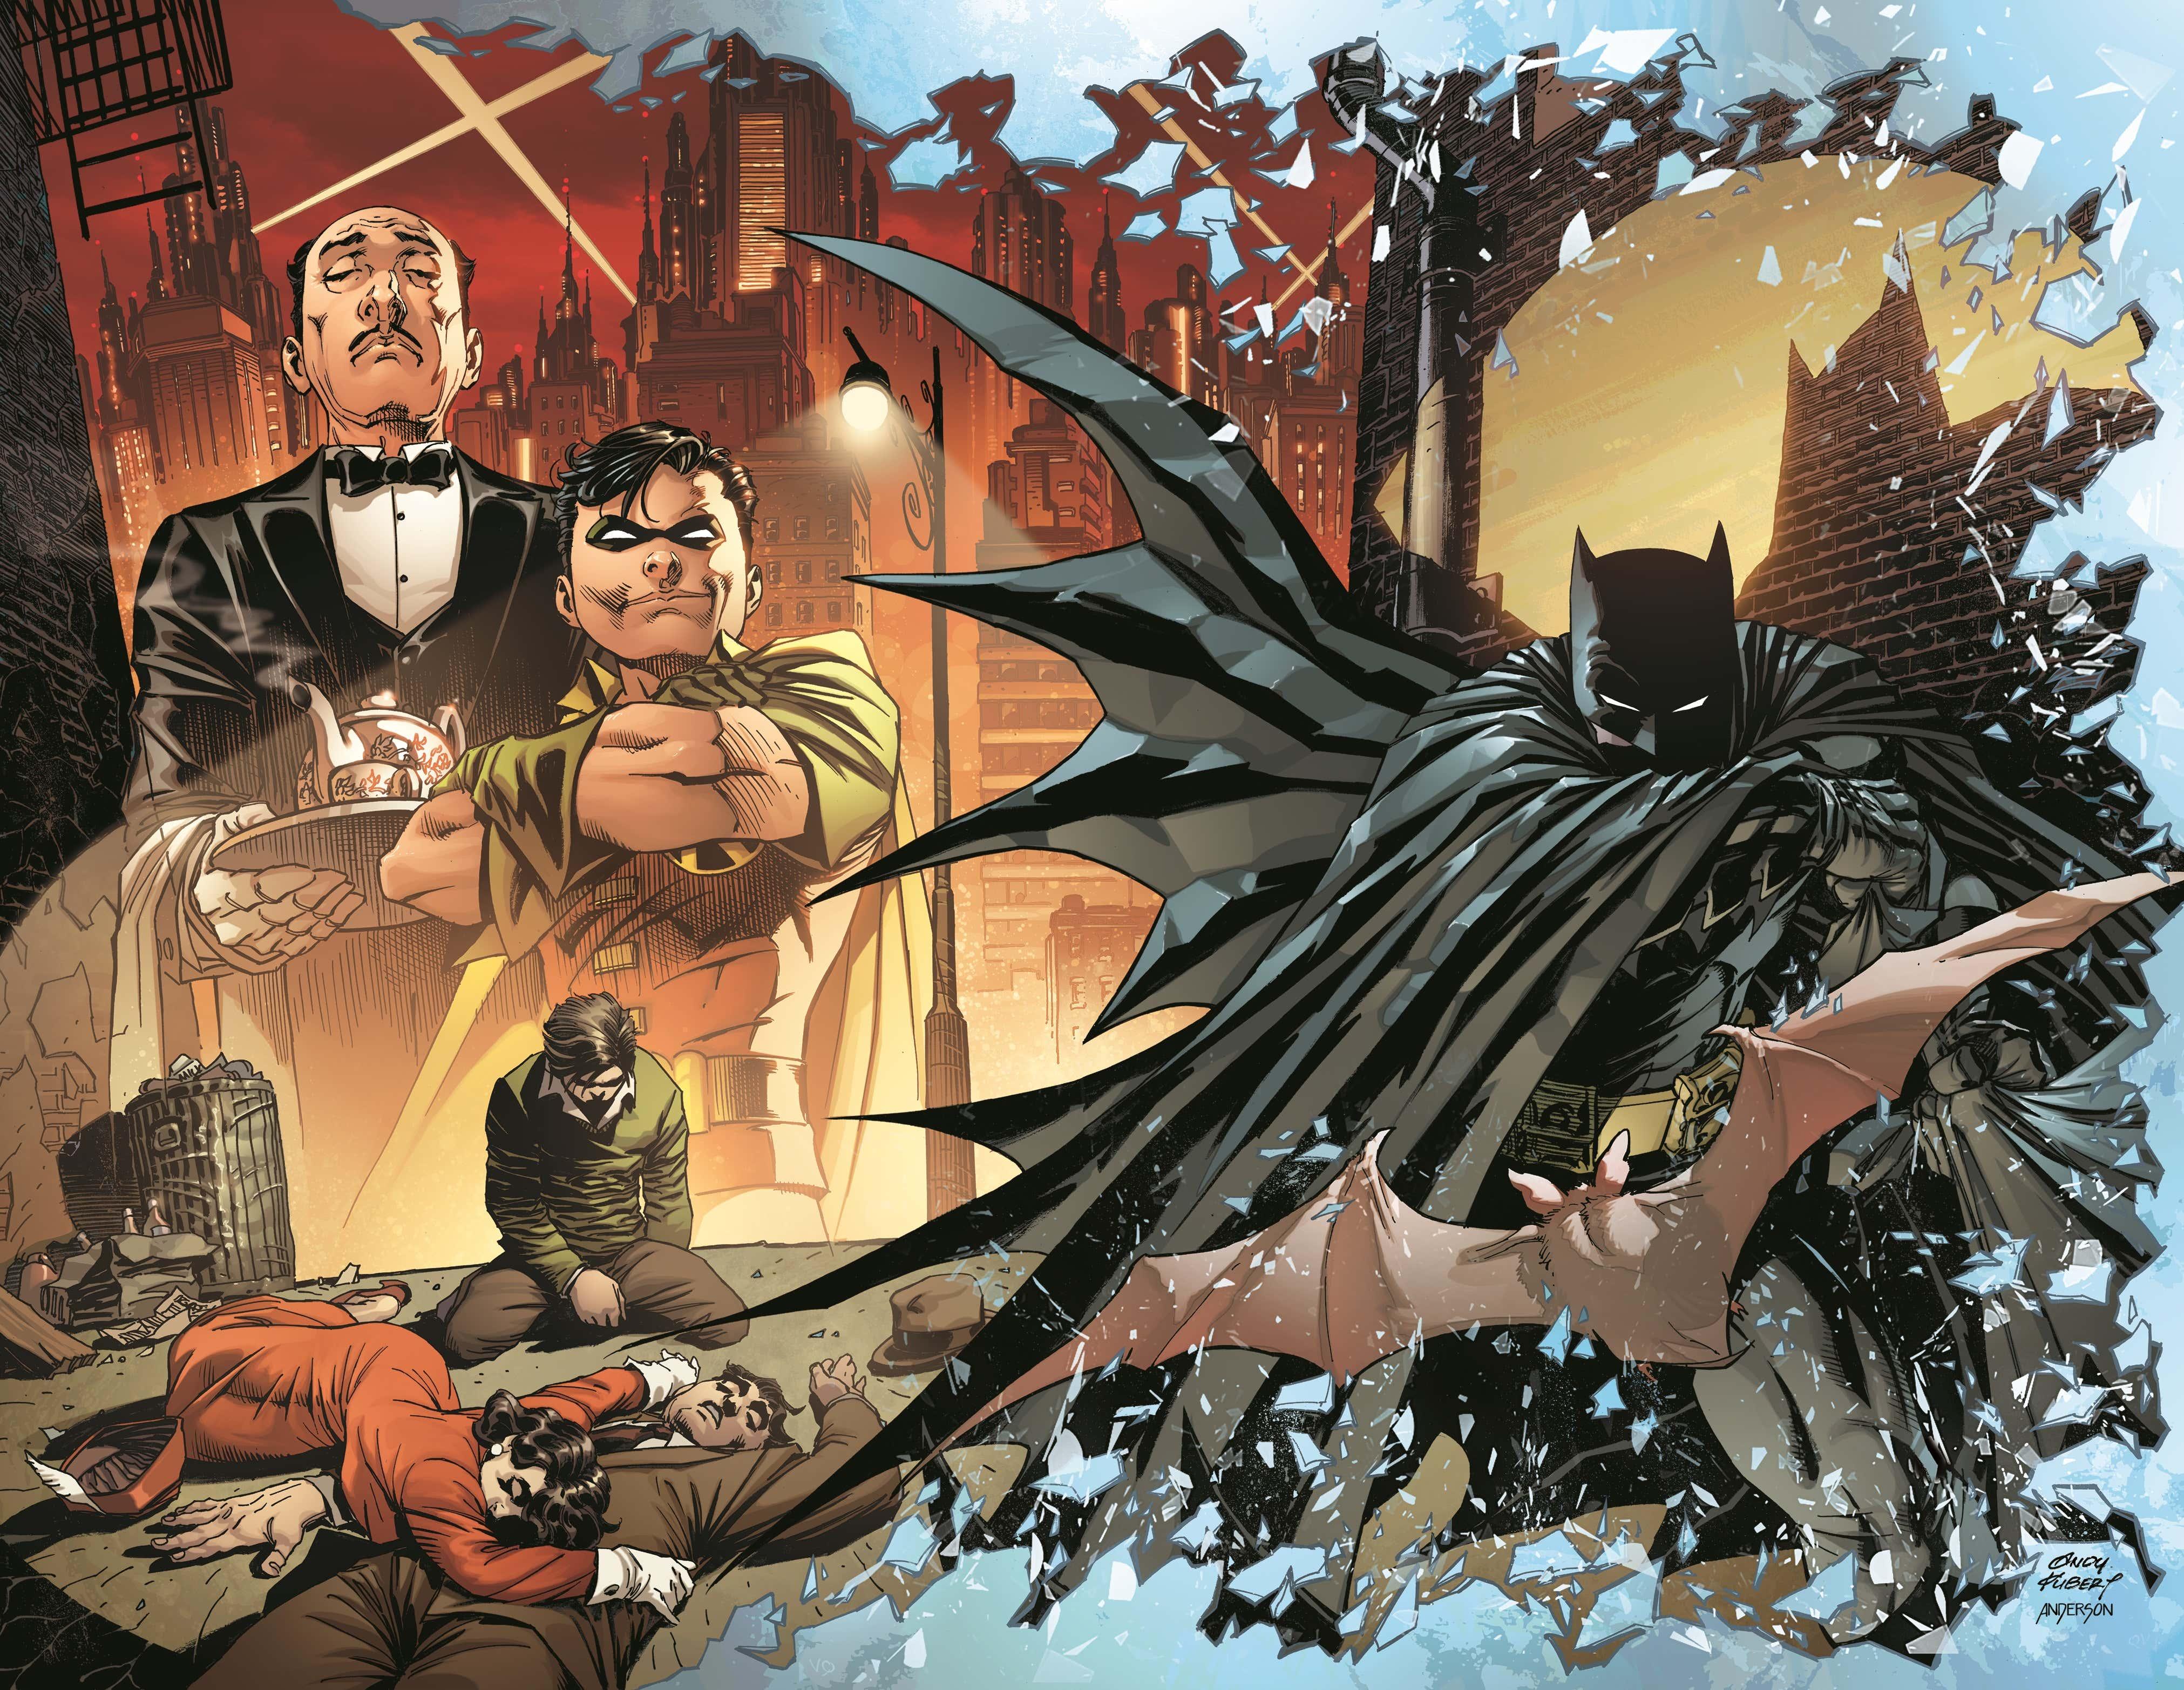 Detective Comics Vol 1 1027 Textless Wraparound Cover.jpg